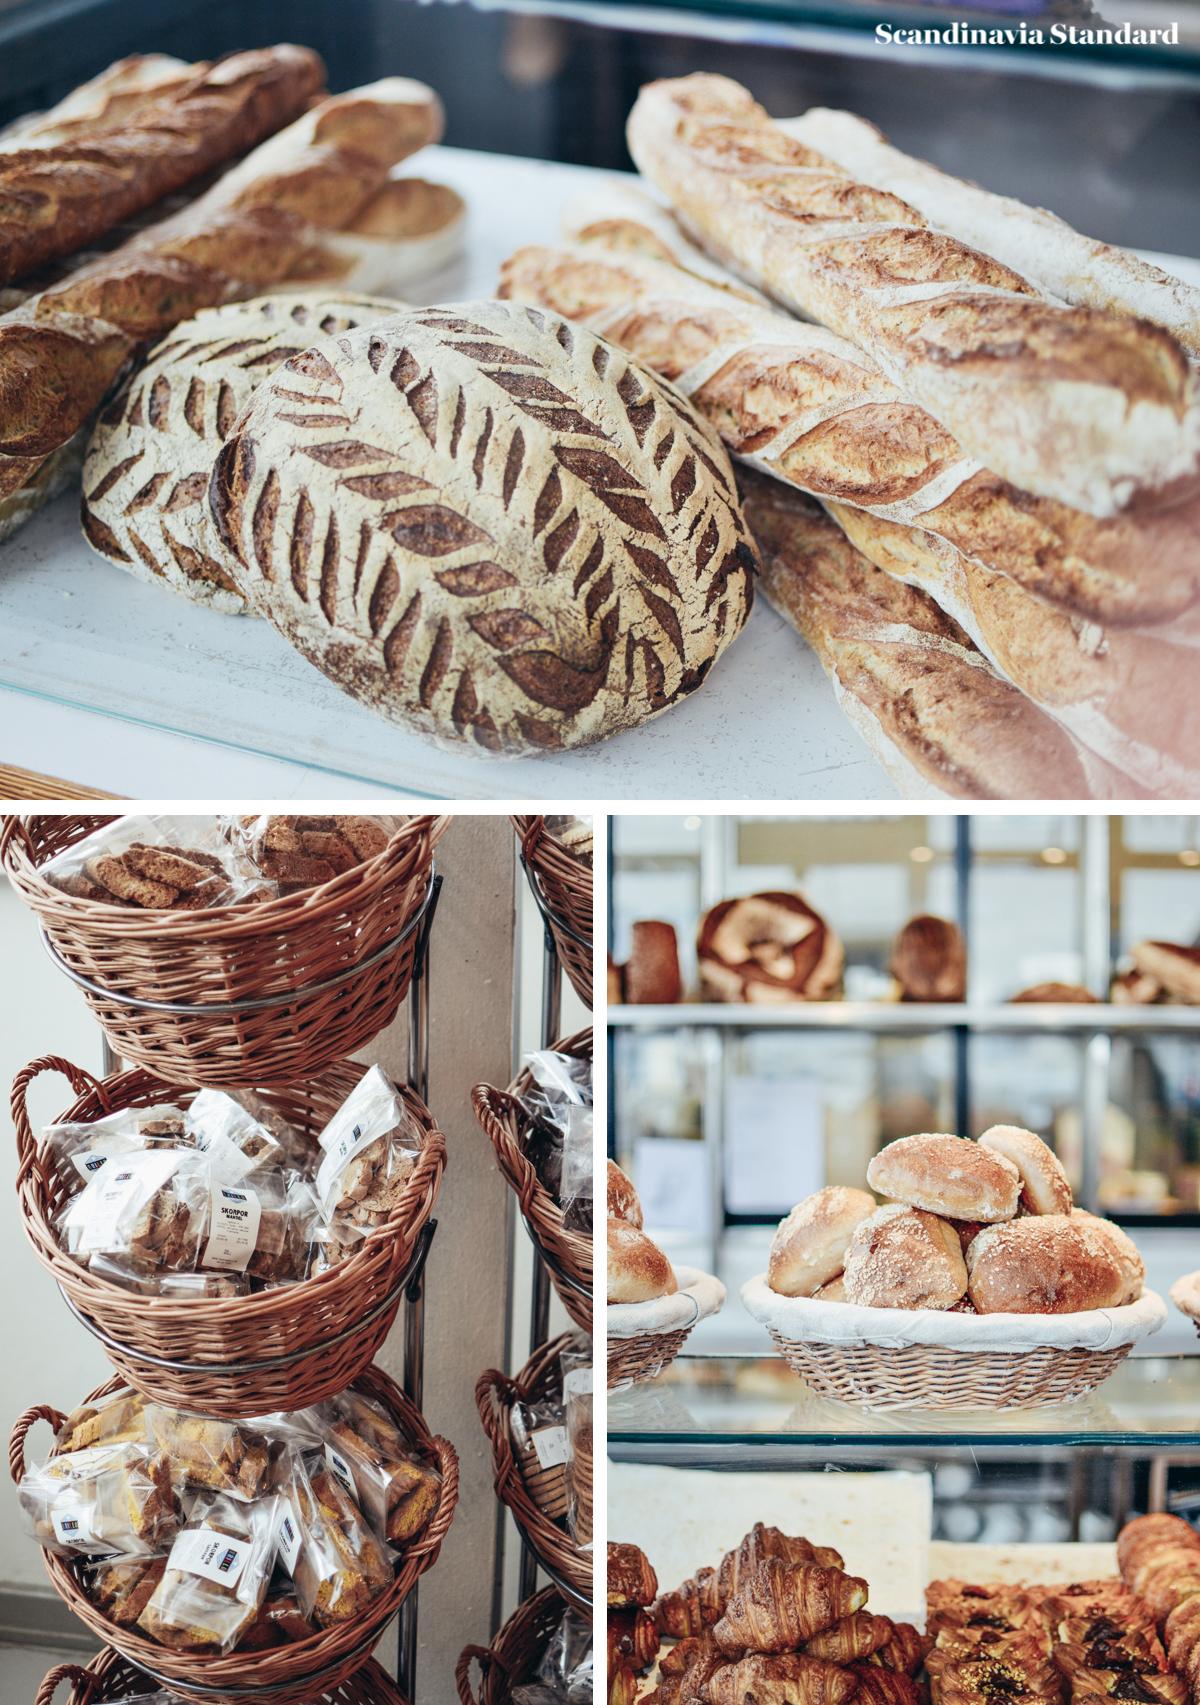 Scandi Six Bakeries - Brillo Box I Scandinavia Standard